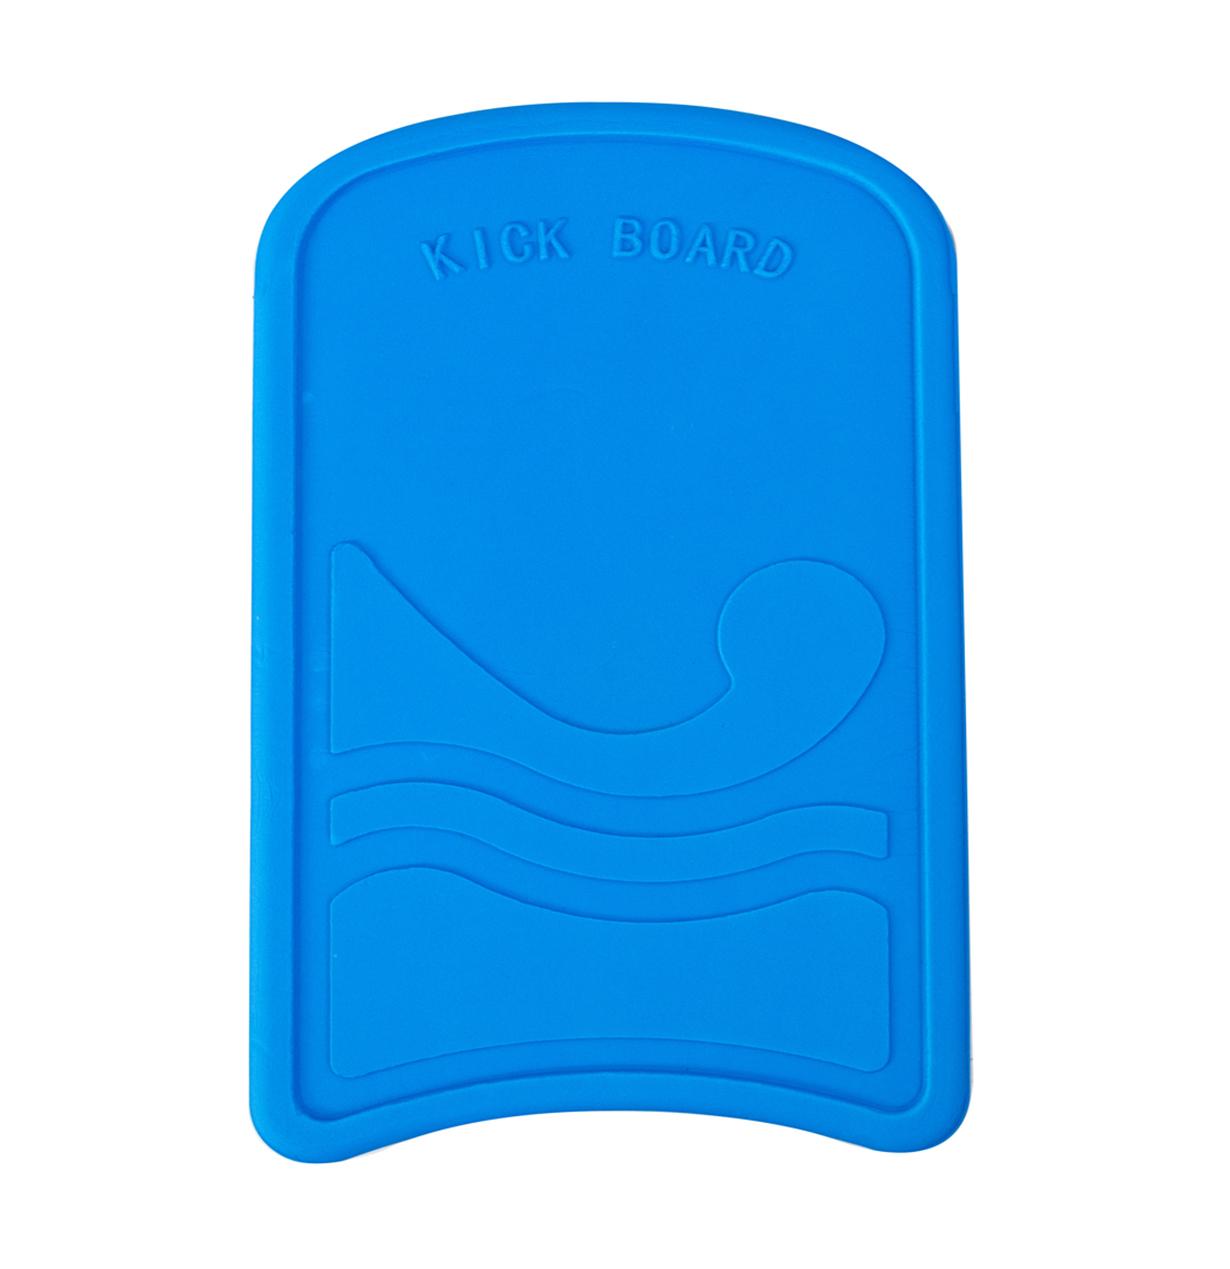 Kick-boards3-A